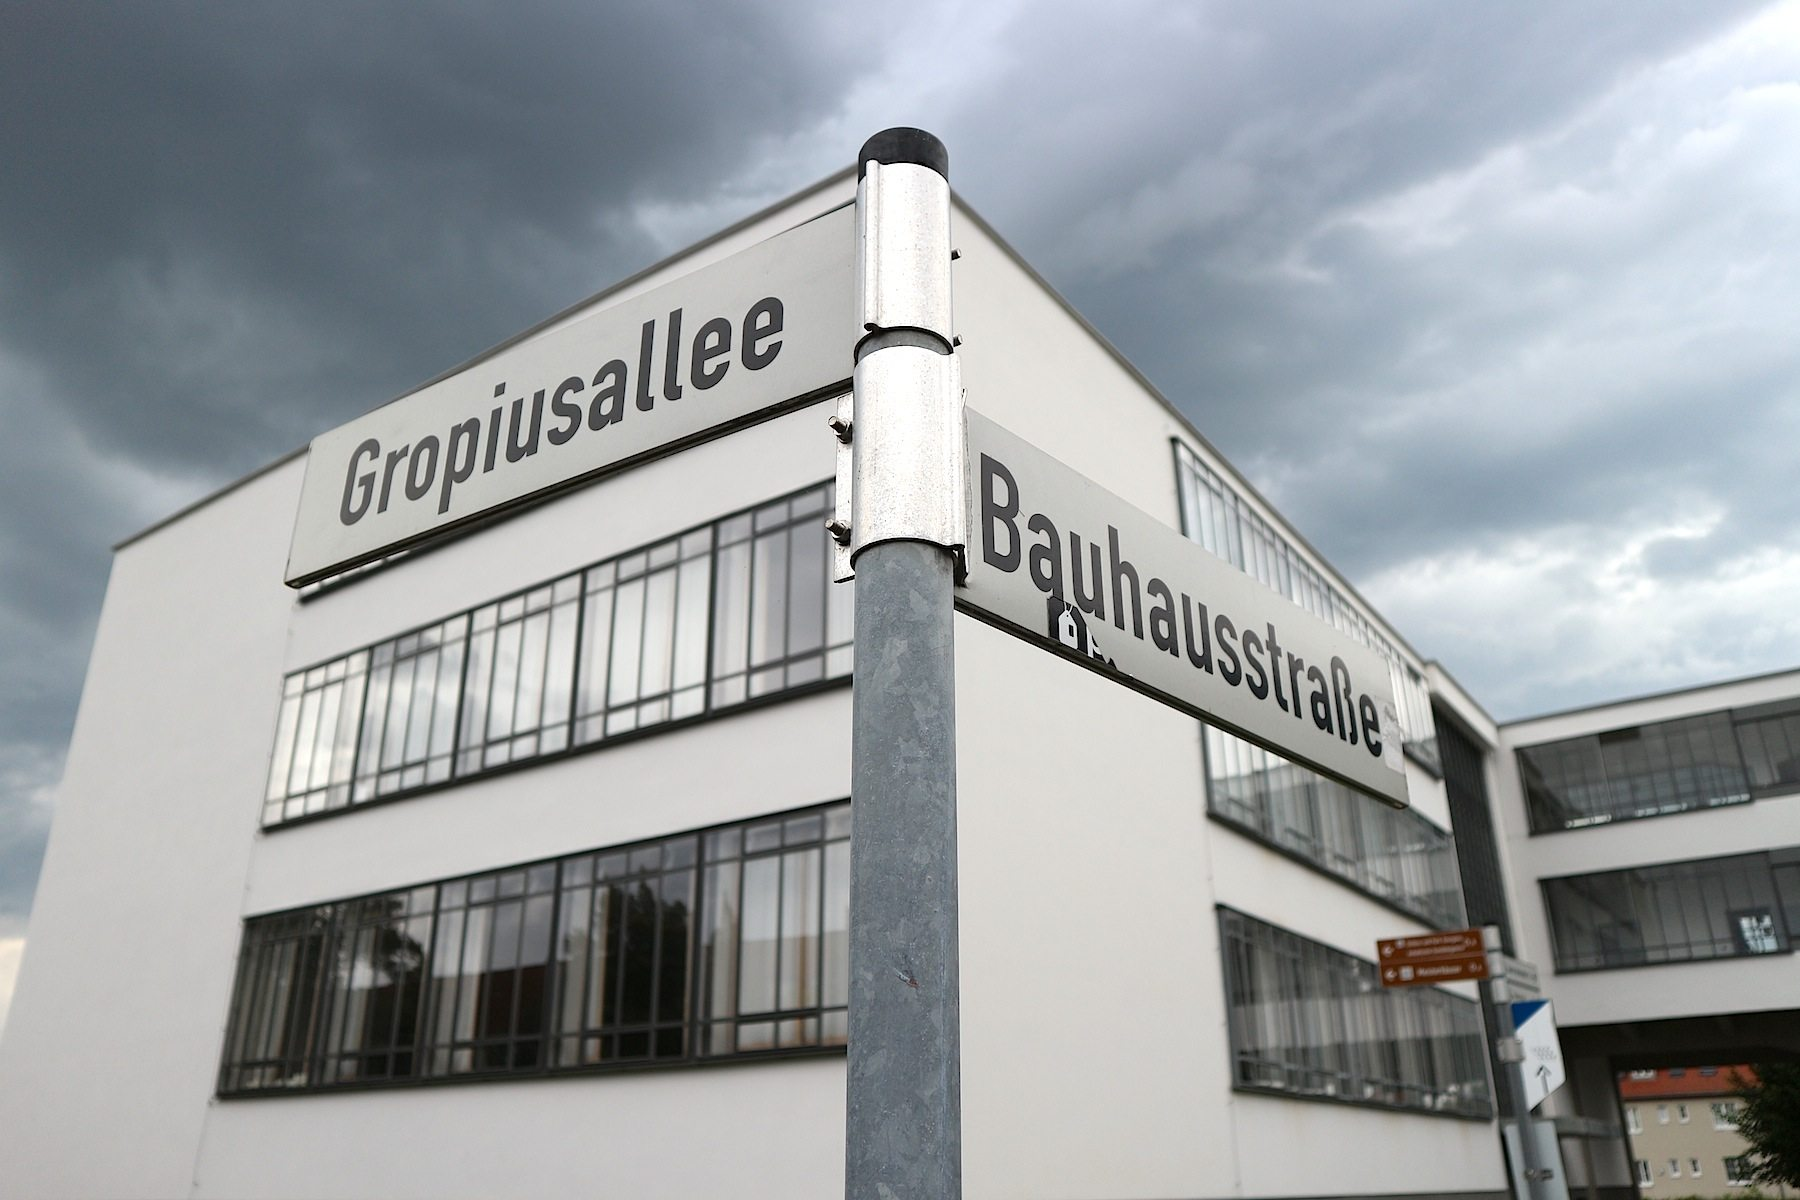 Gropiusallee, Ecke Bauhausstraße.